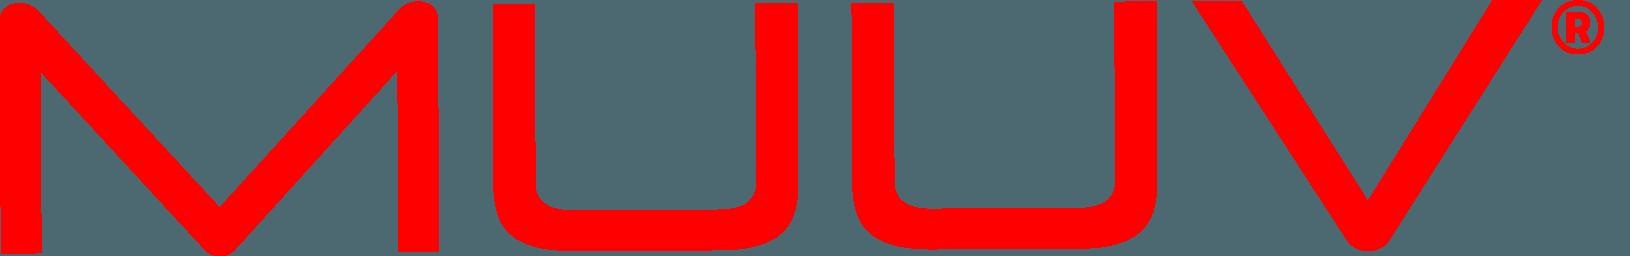 Muuv logo